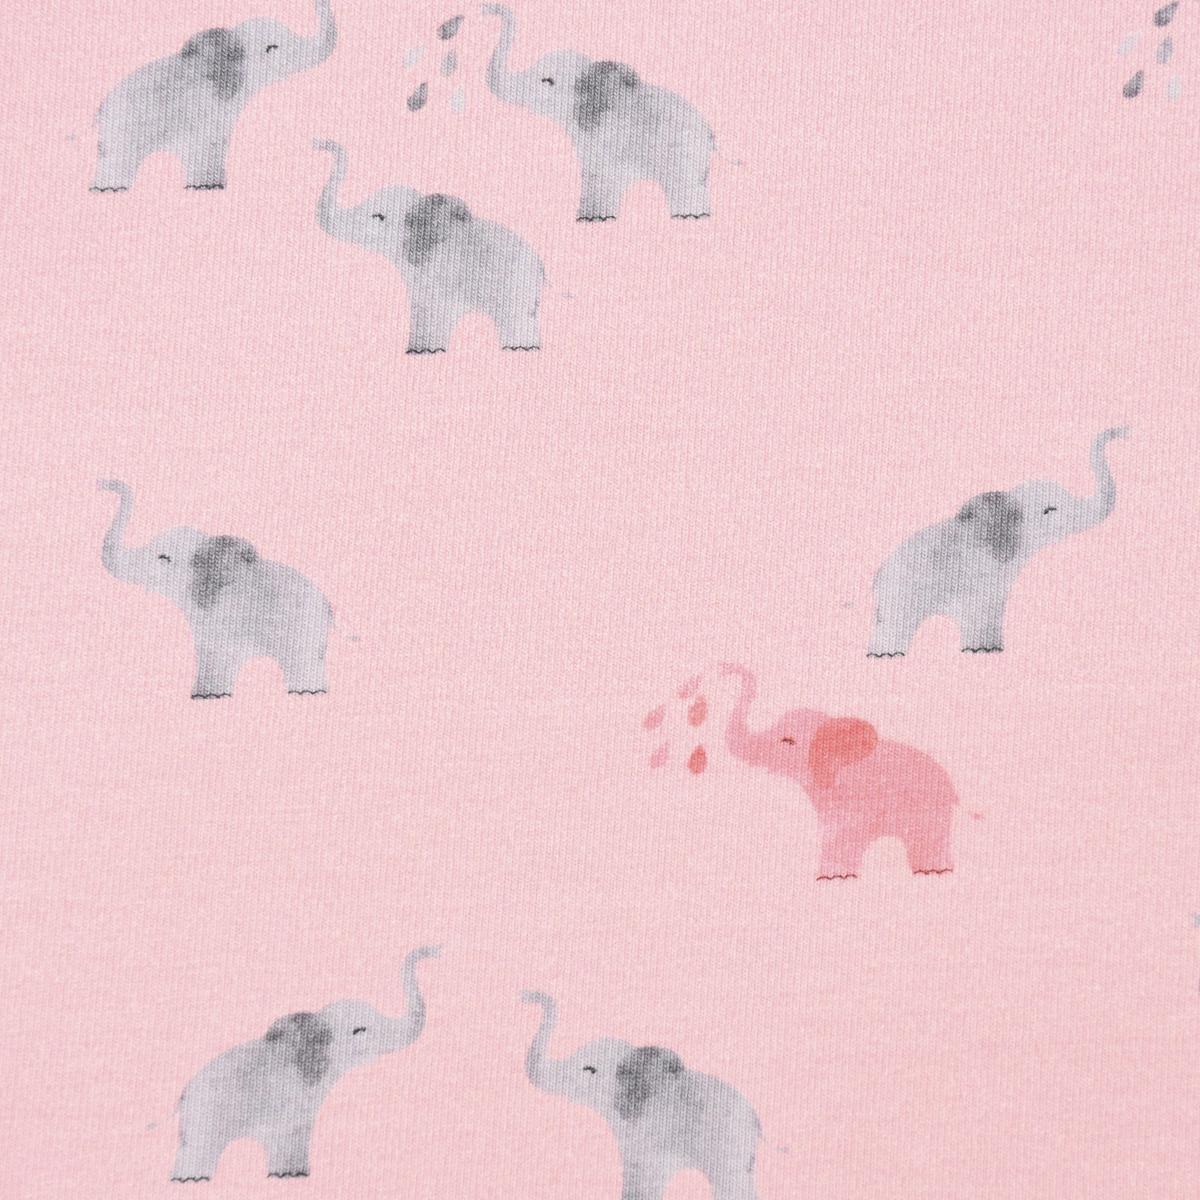 Baumwolljersey Digitaldruck Elefanten rosa grau 1,5m Breite